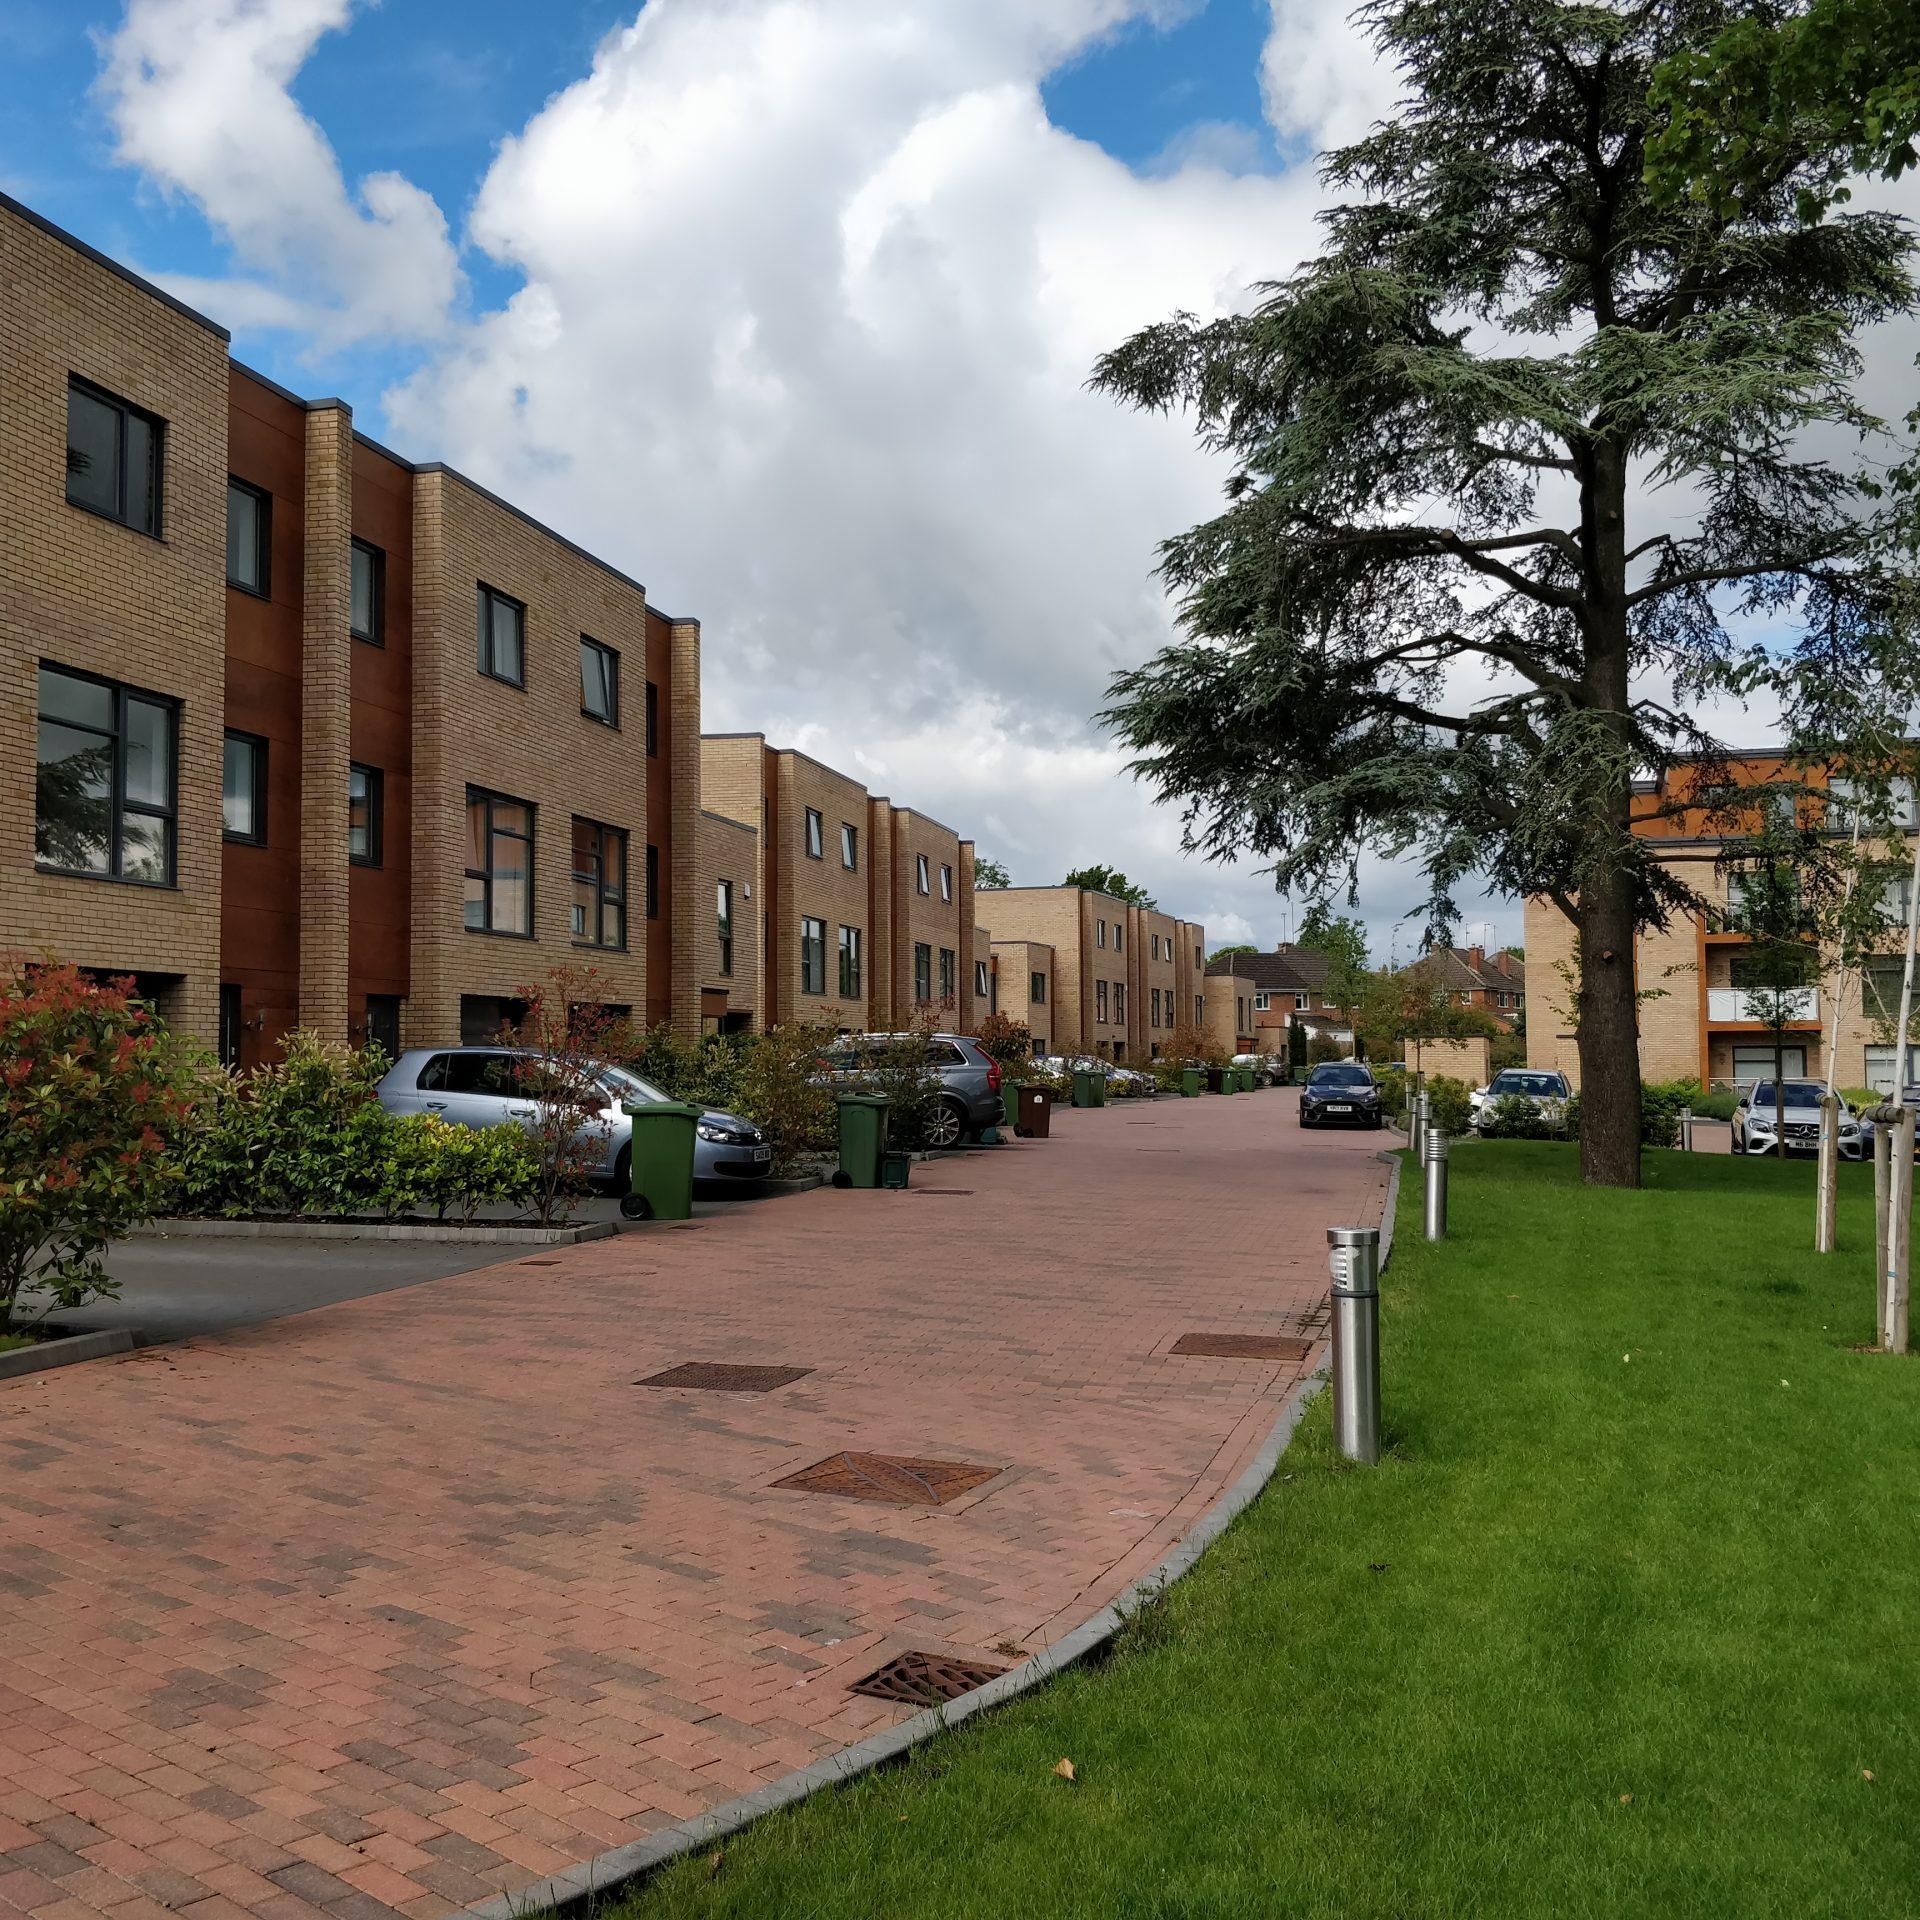 Award winning 33 home brownfield redevelopment, <br> Cheltenham